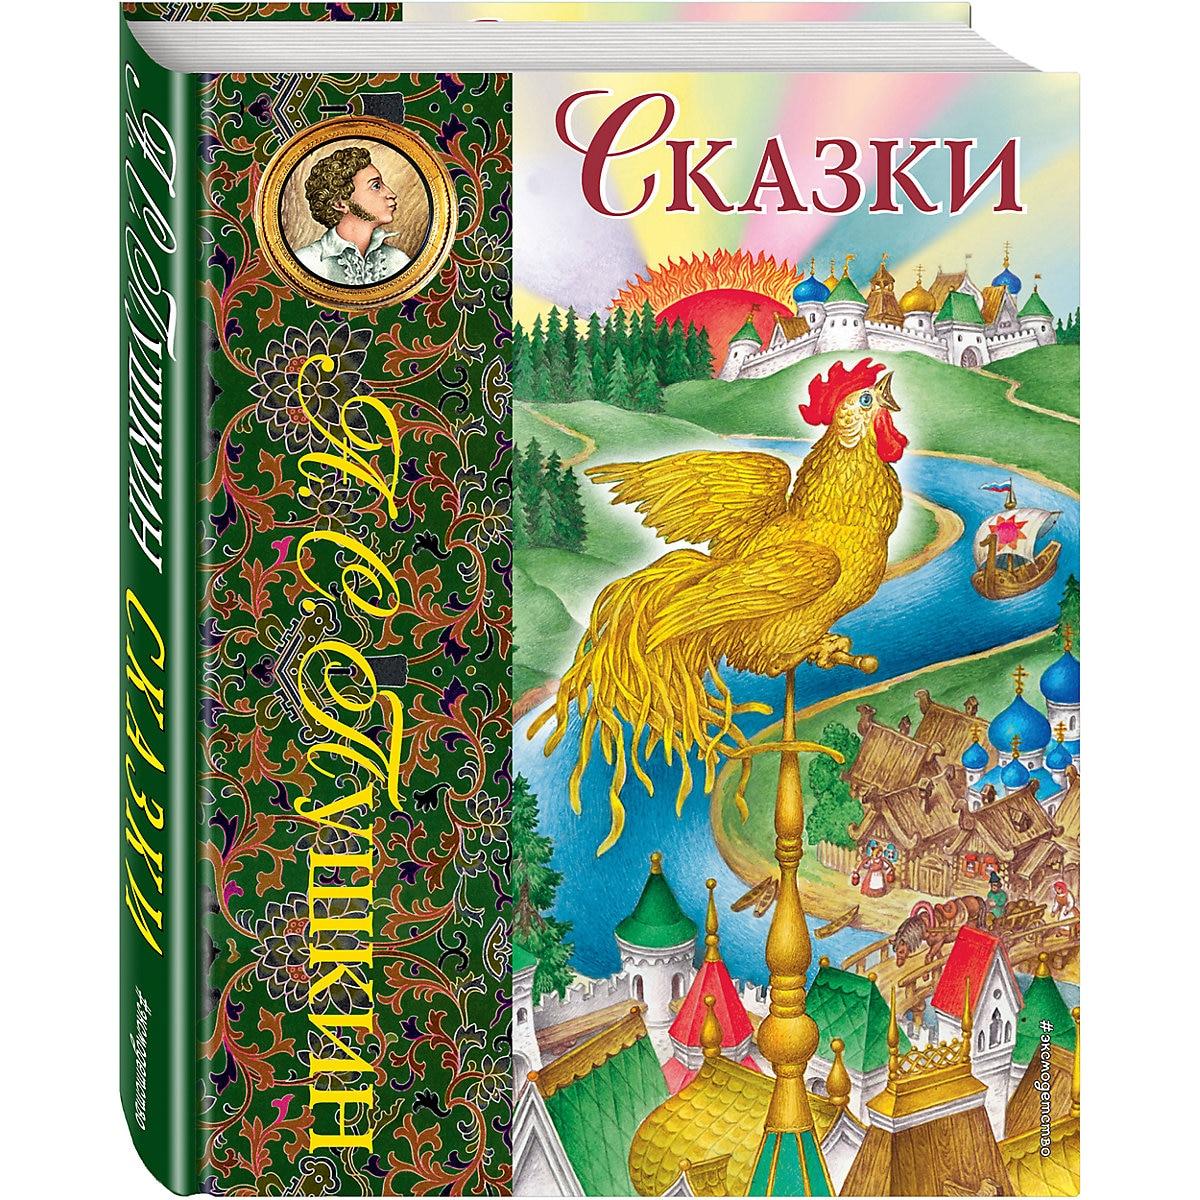 Books EKSMO 7367729 Children Education Encyclopedia Alphabet Dictionary Book For Baby MTpromo